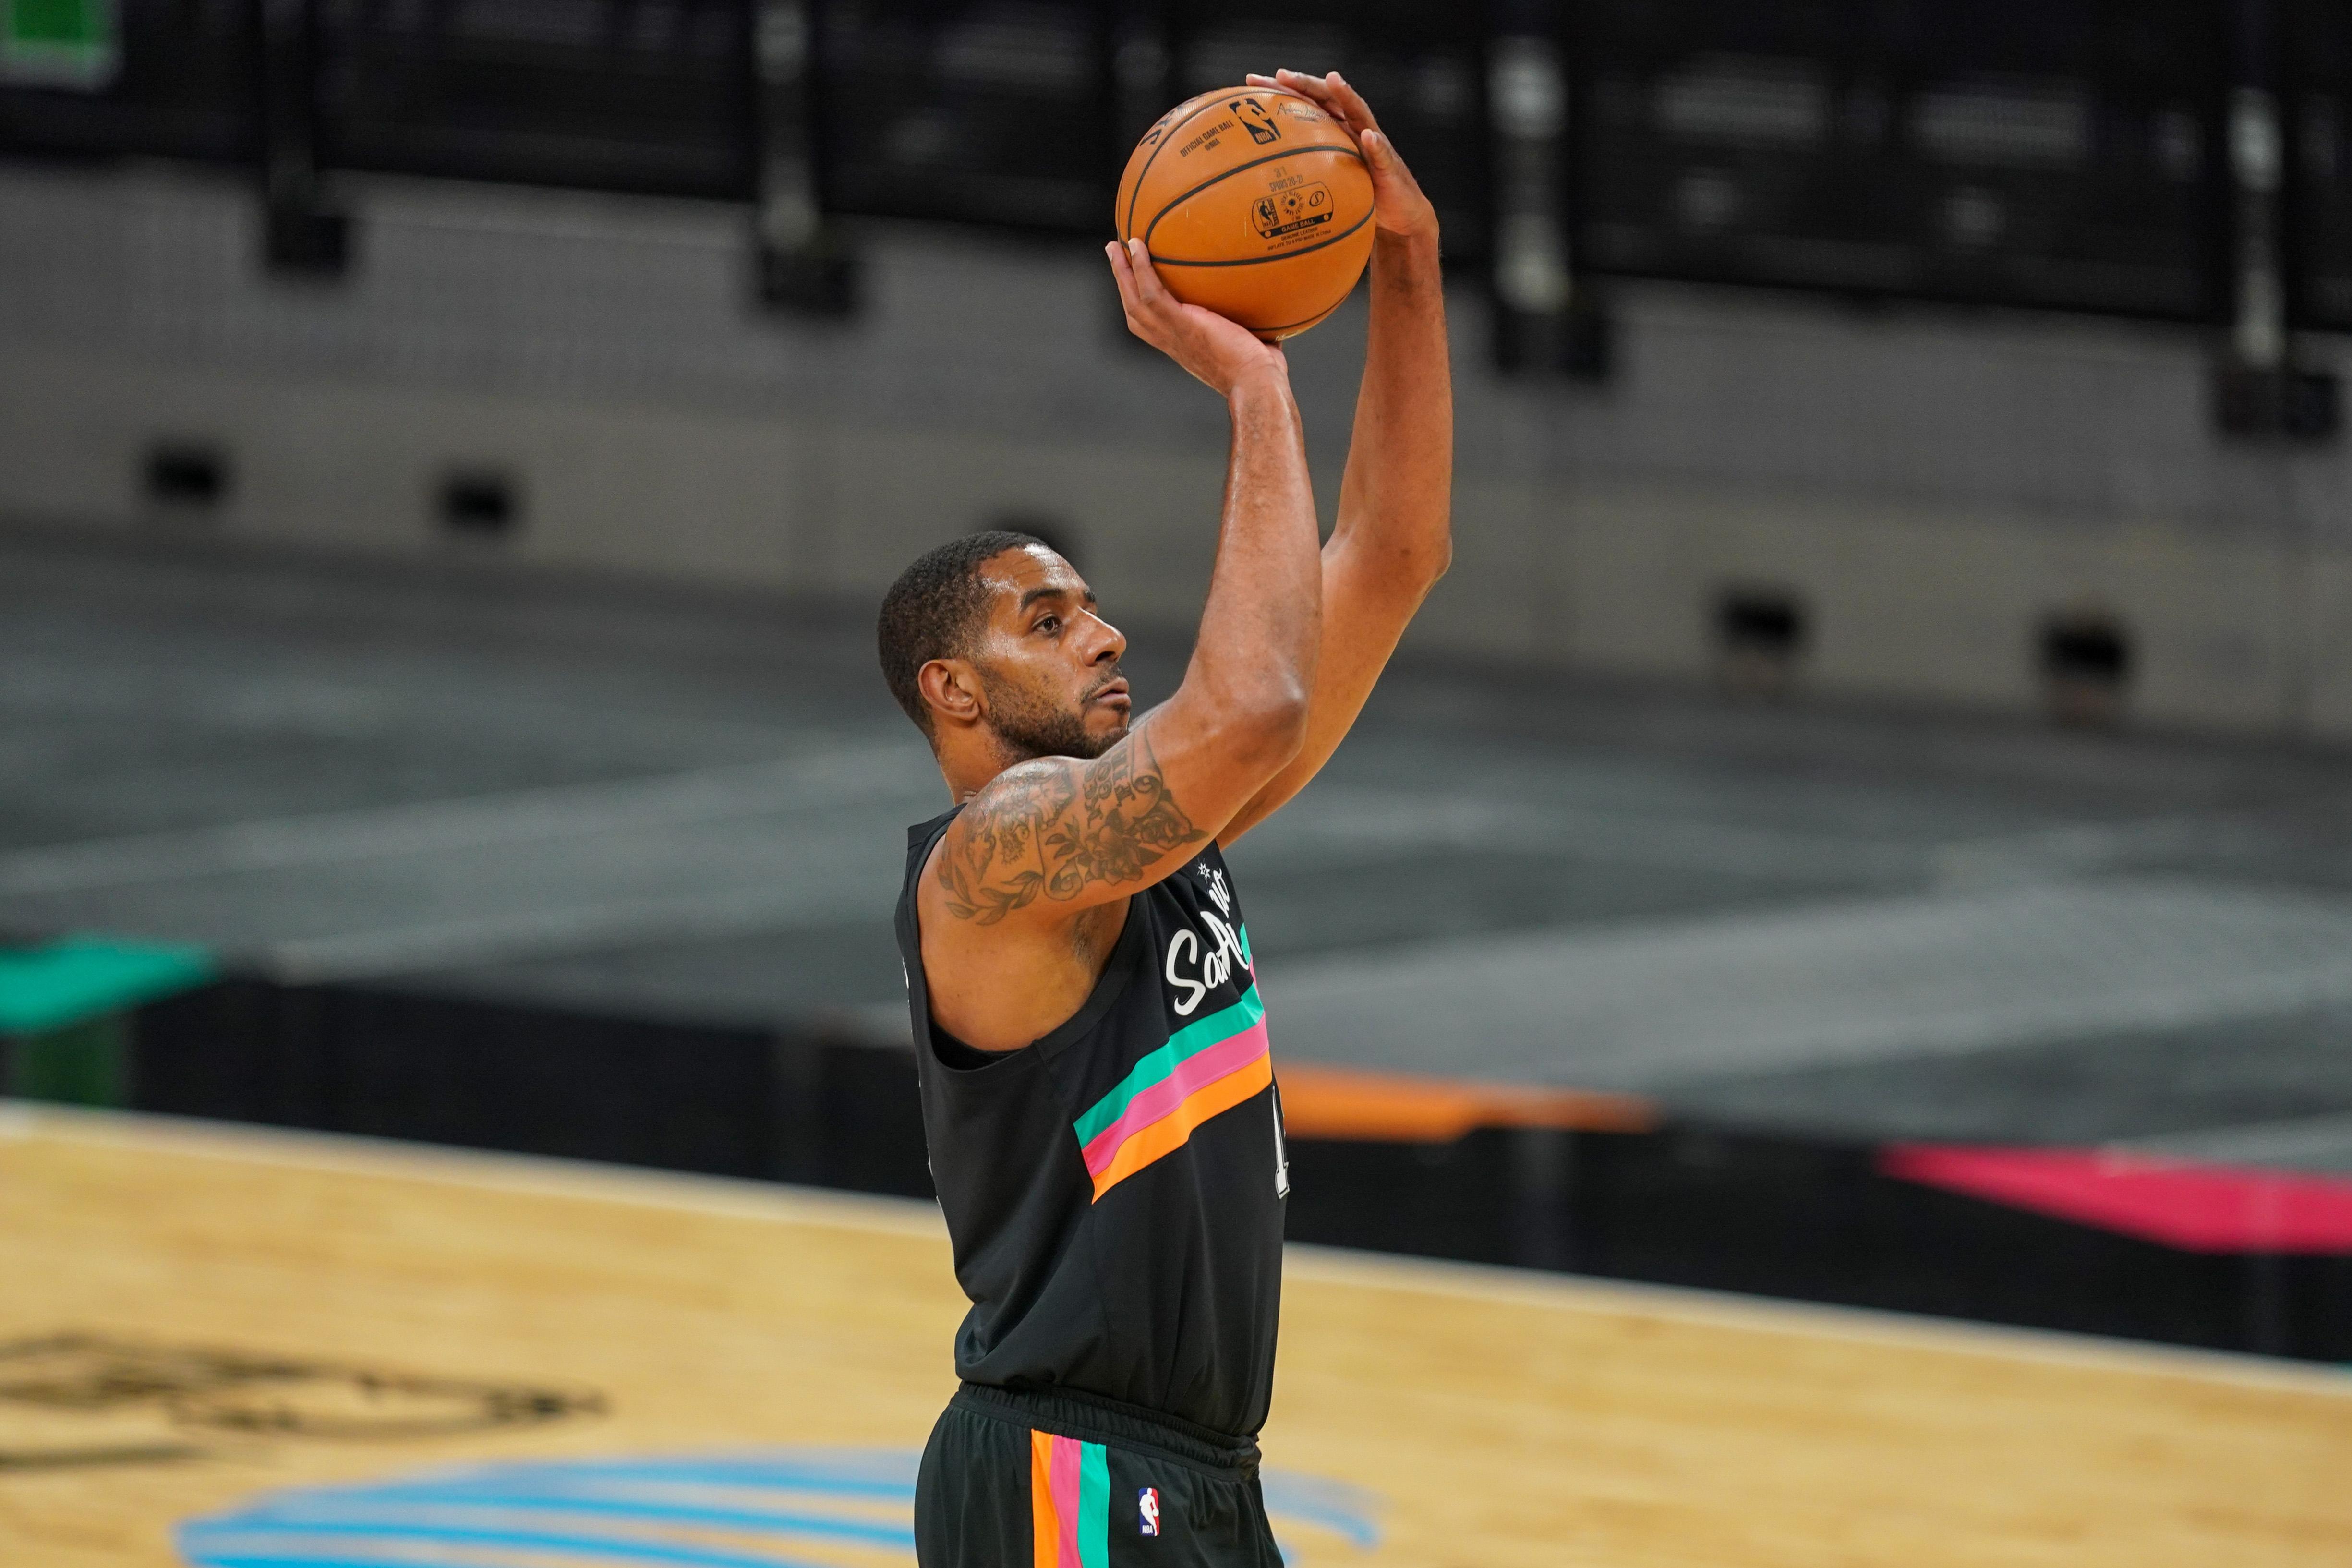 Jan 22, 2021; San Antonio, Texas, USA; San Antonio Spurs center LaMarcus Aldridge (12) shoots in the first half against the Dallas Mavericks at the AT&T Center.